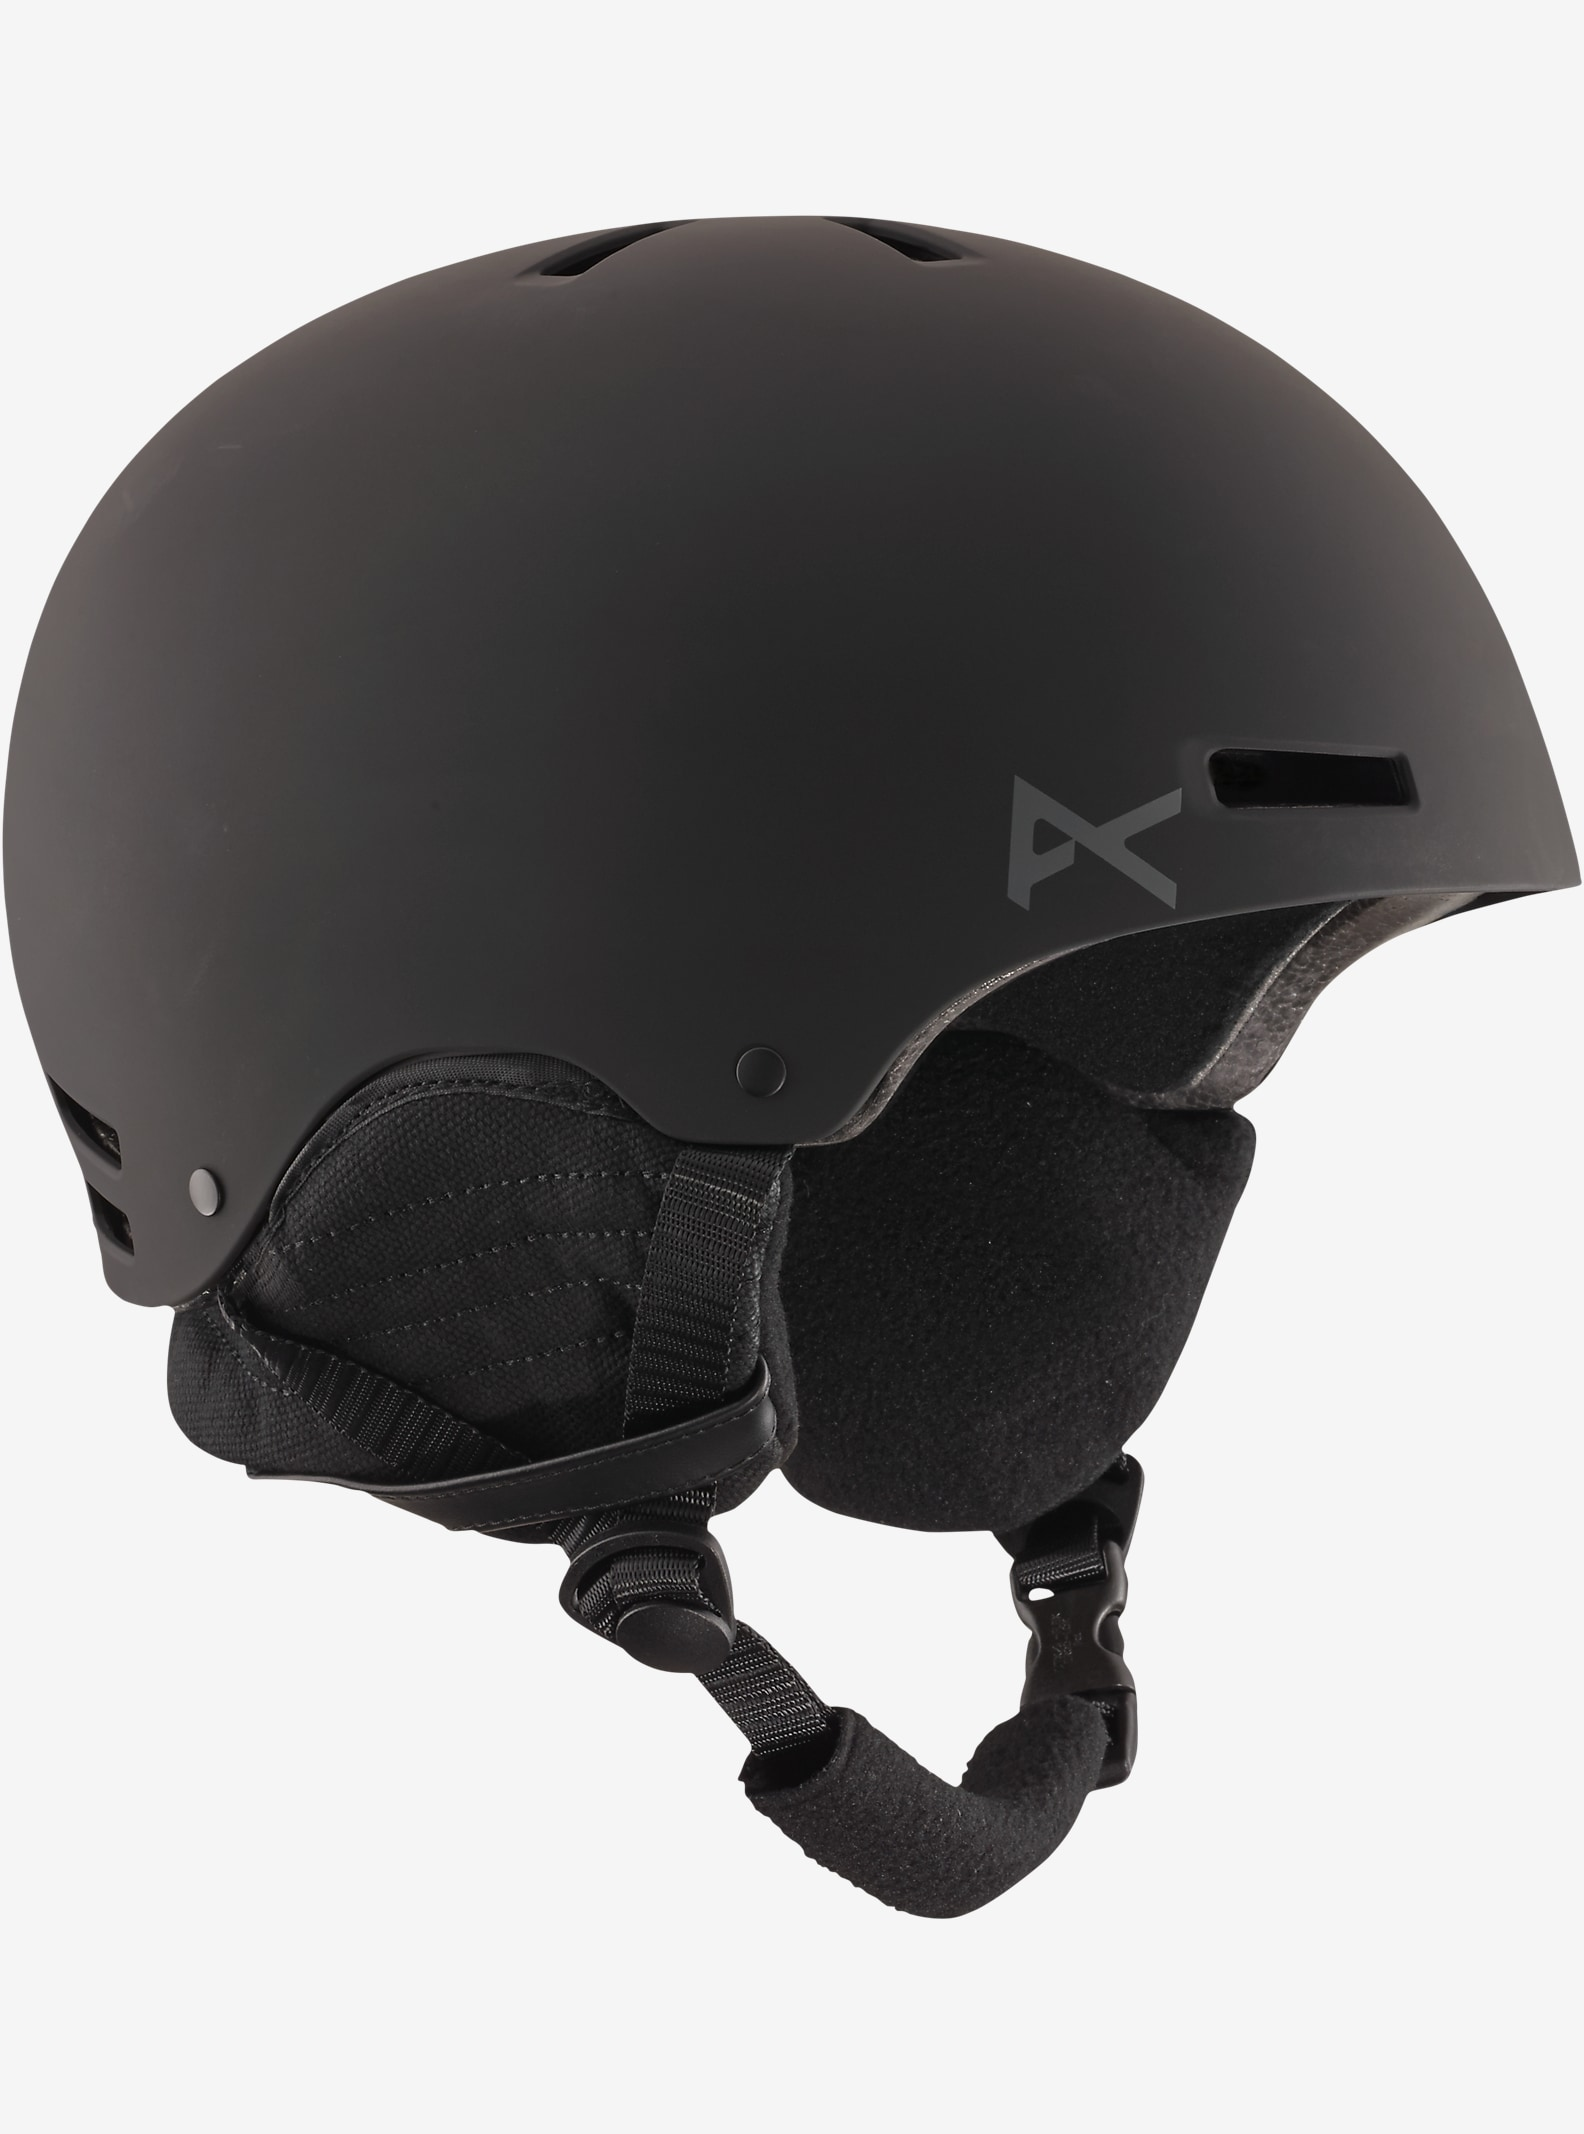 anon. Raider Helmet shown in Black